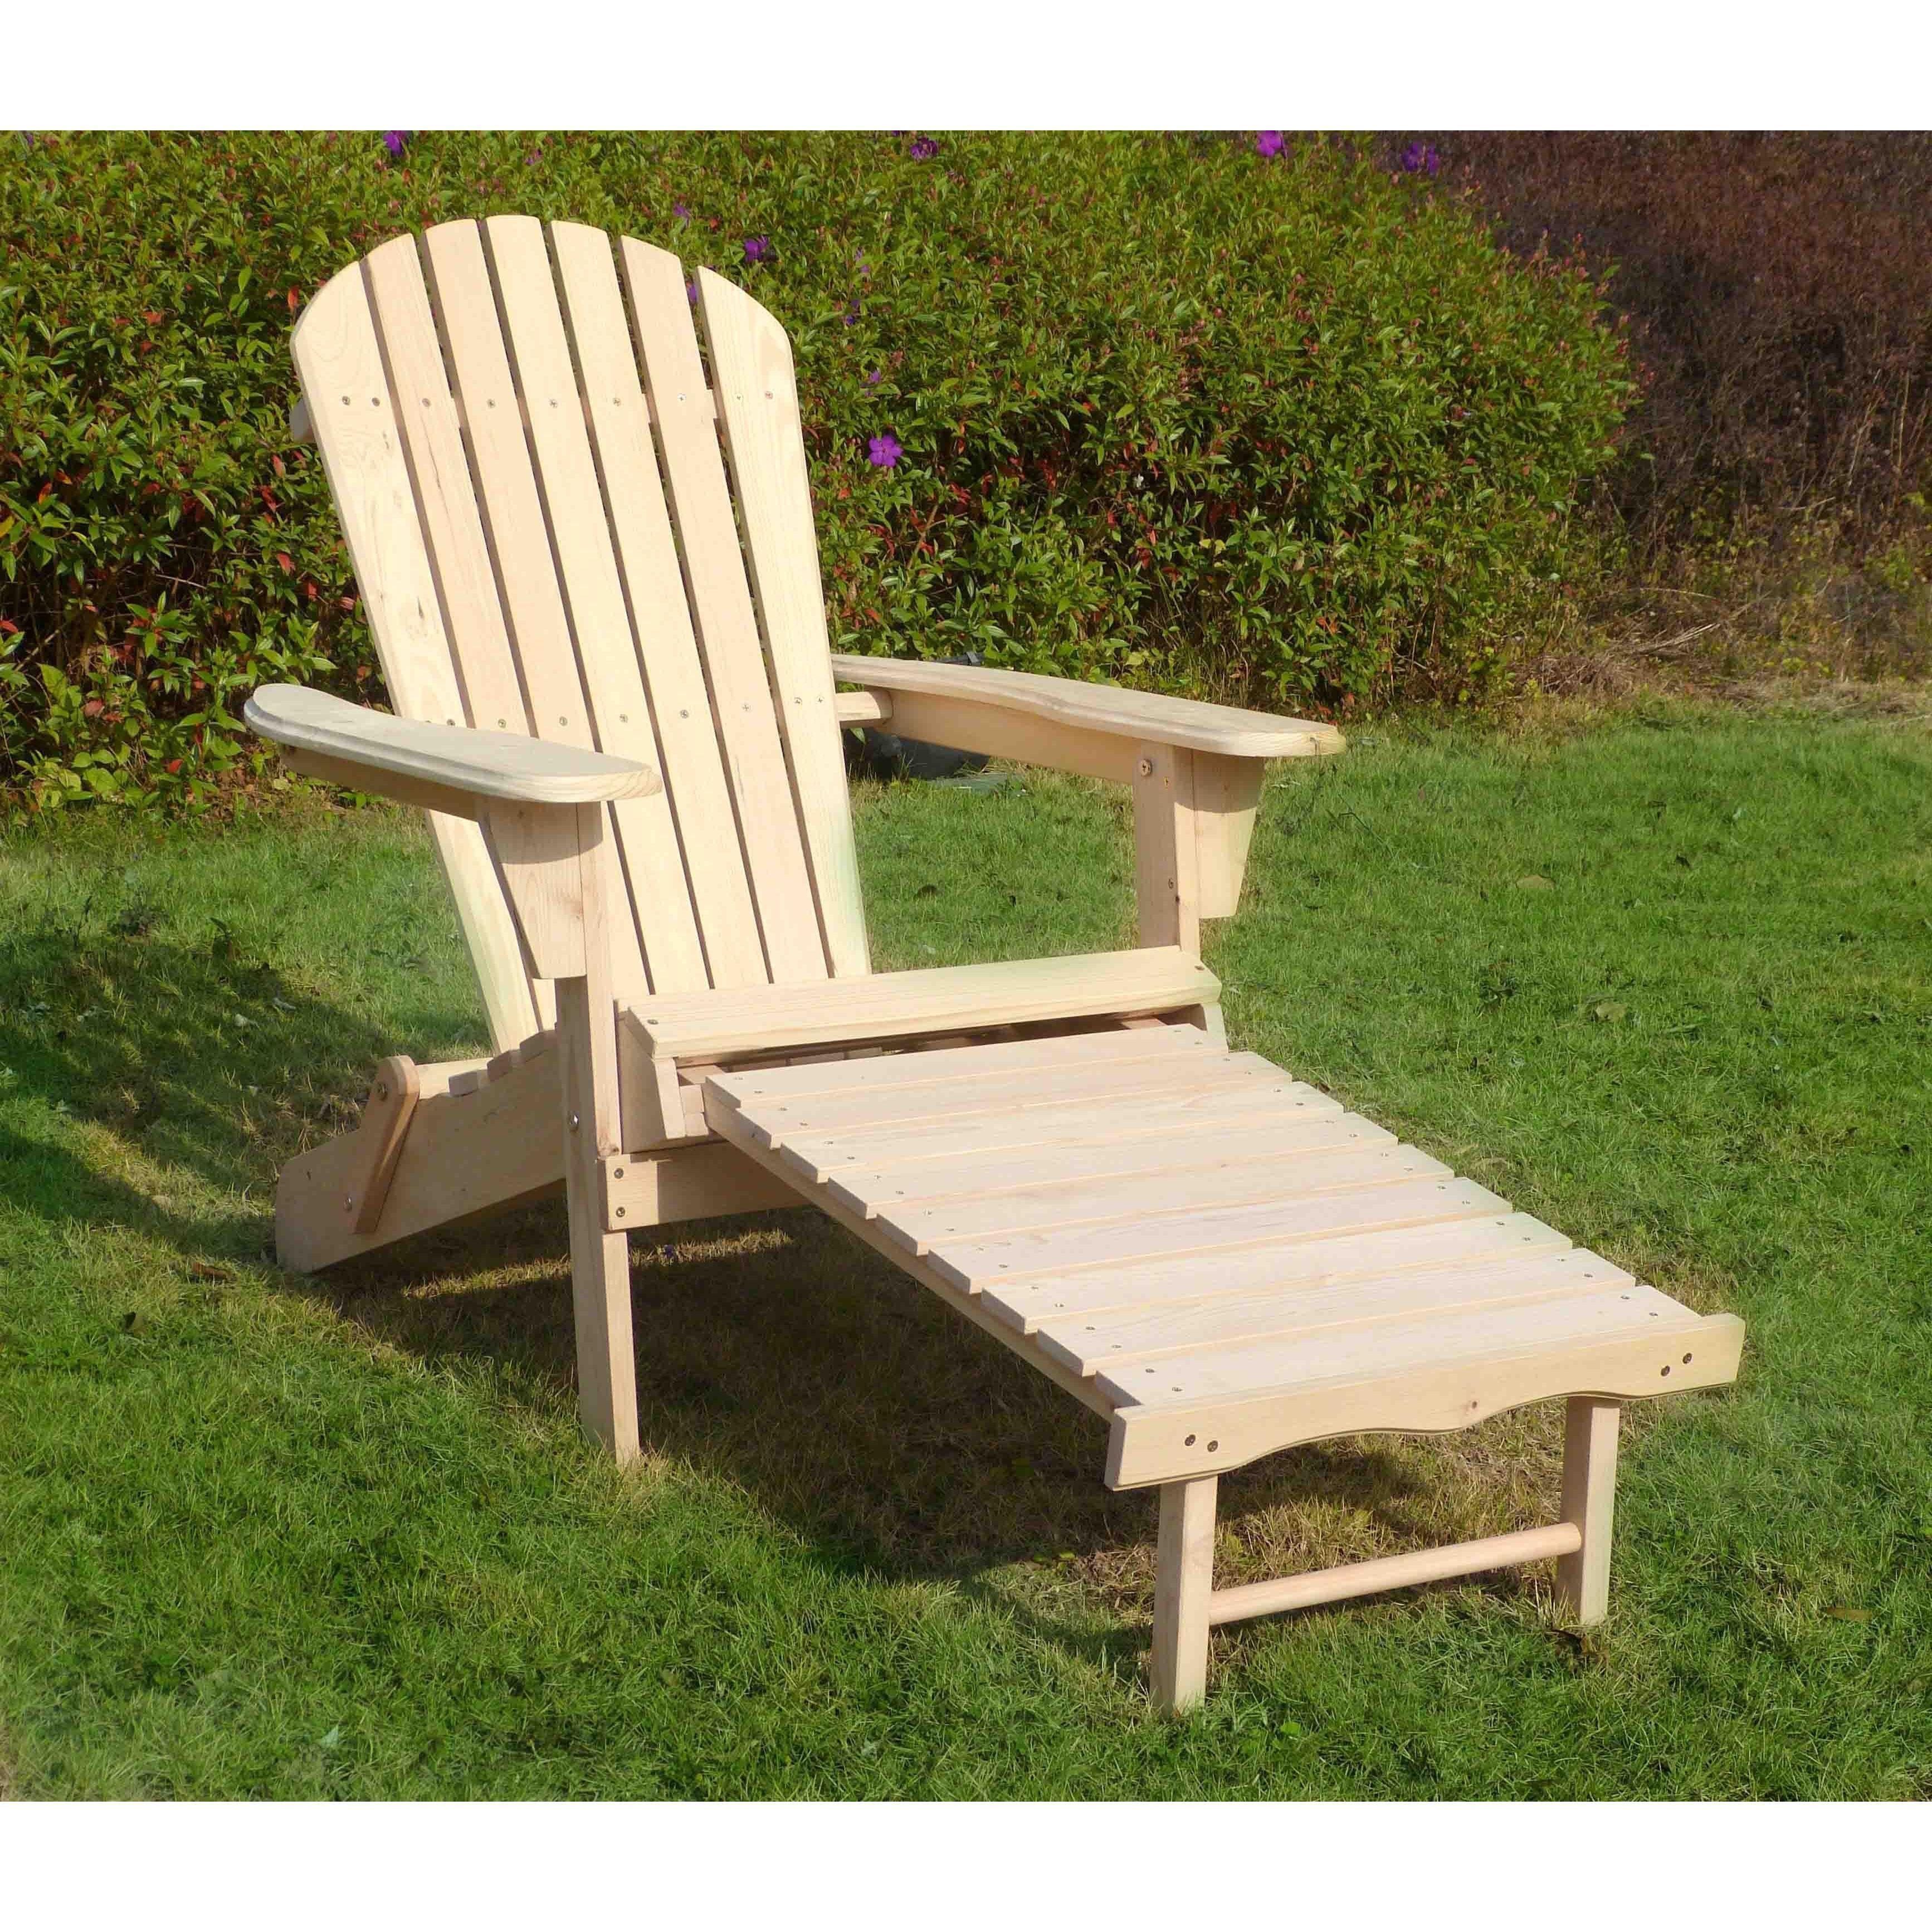 Porch & Den Buckhead Arden Adirondack Chair Kit With